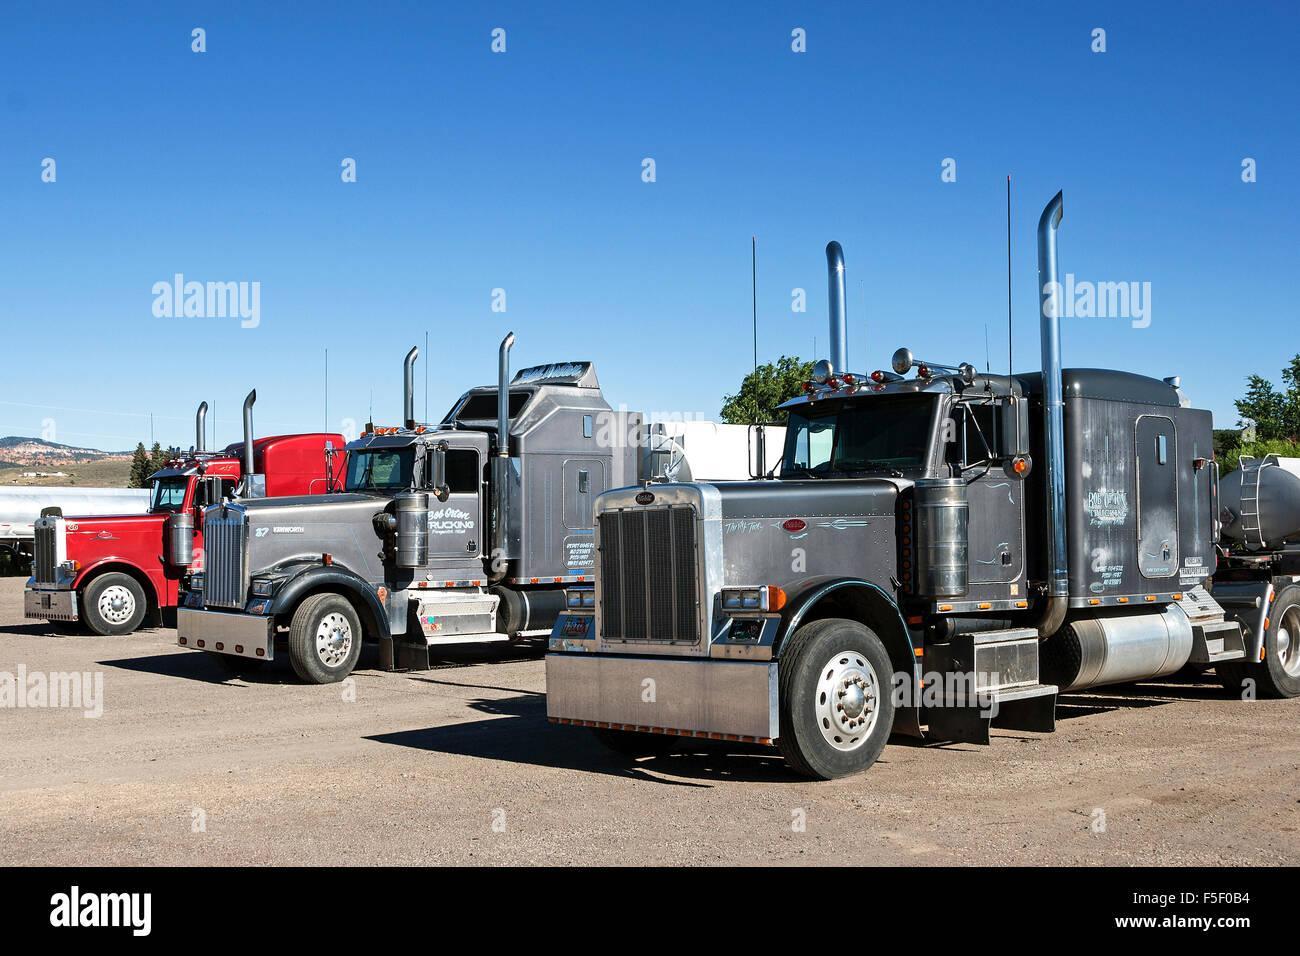 American trucks, Kenworth and Peterbilt, in parking lot, Arizona, USA - Stock Image